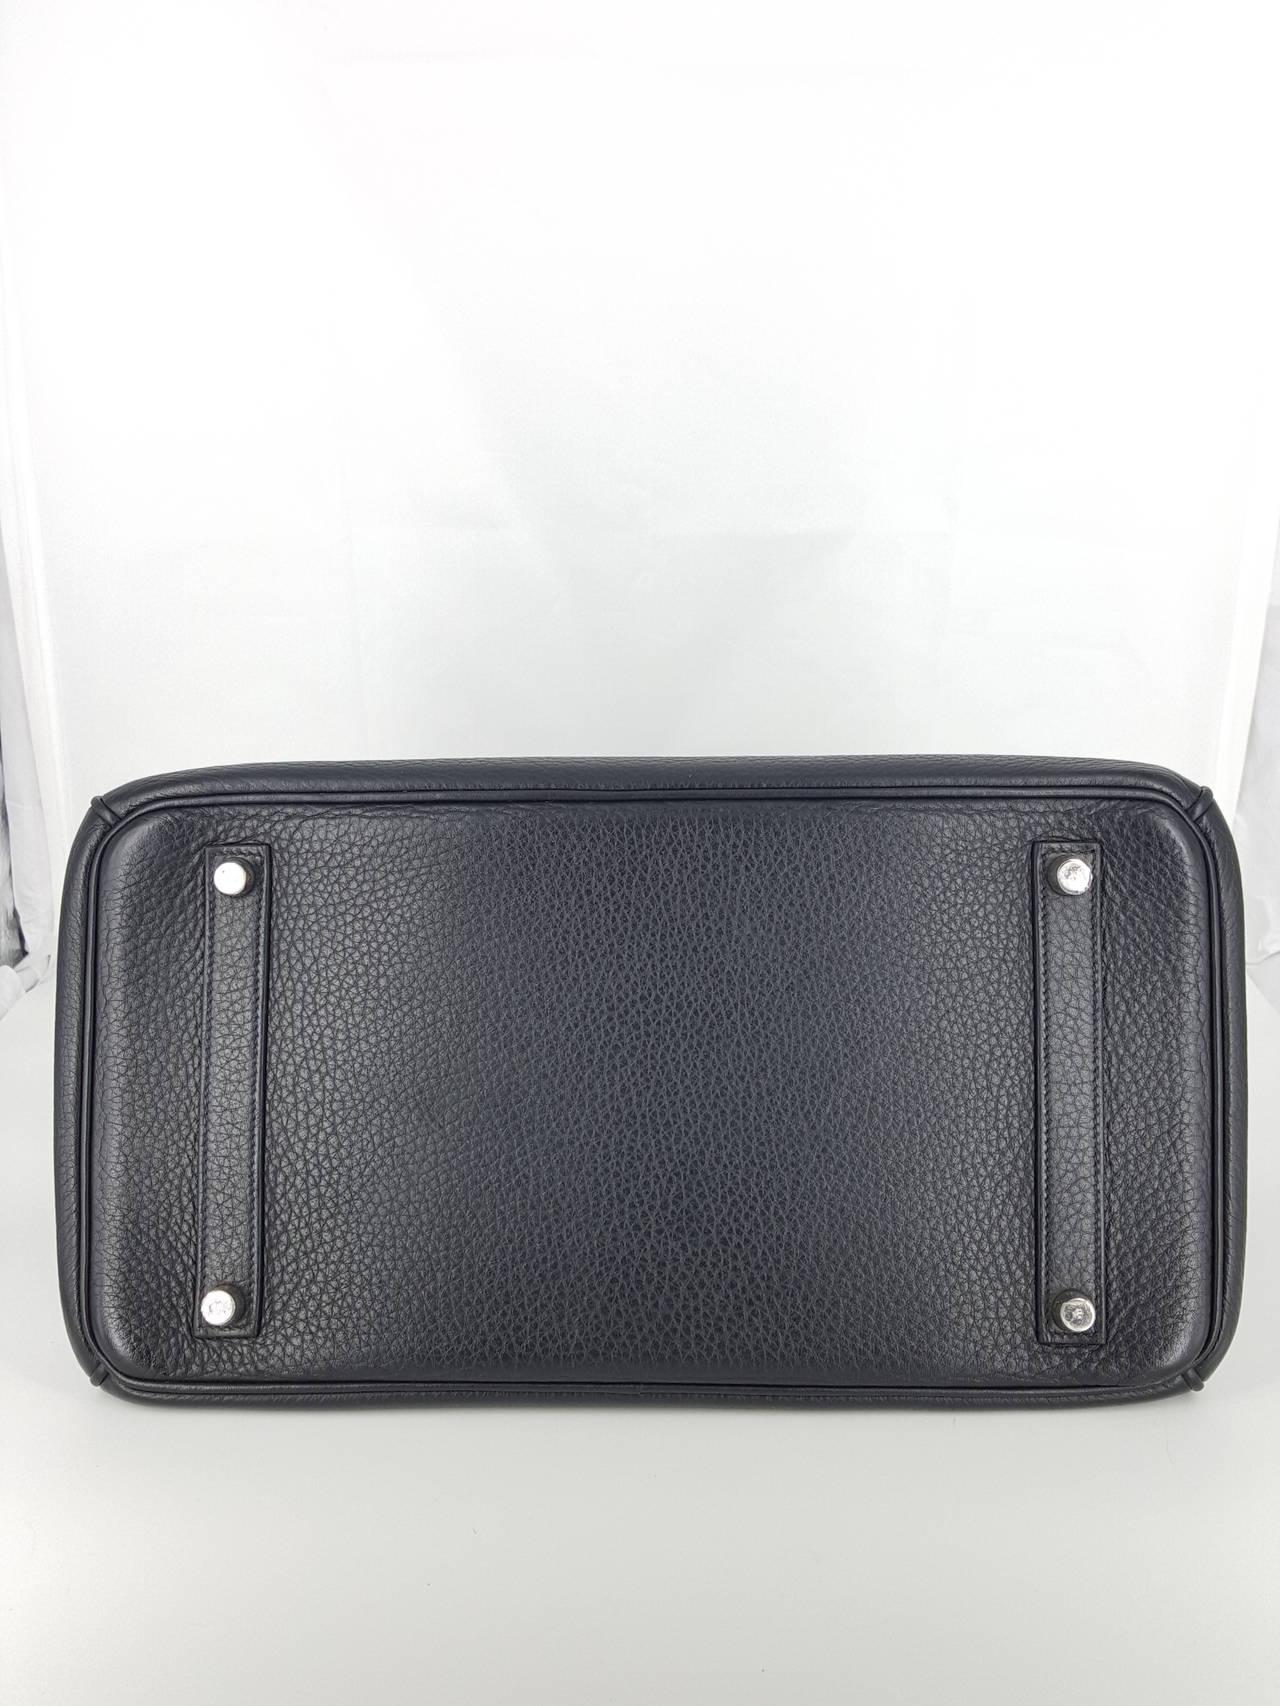 HERMES Birkin 35 CM In Black Clemence Leather With Palladium Hardware. 5